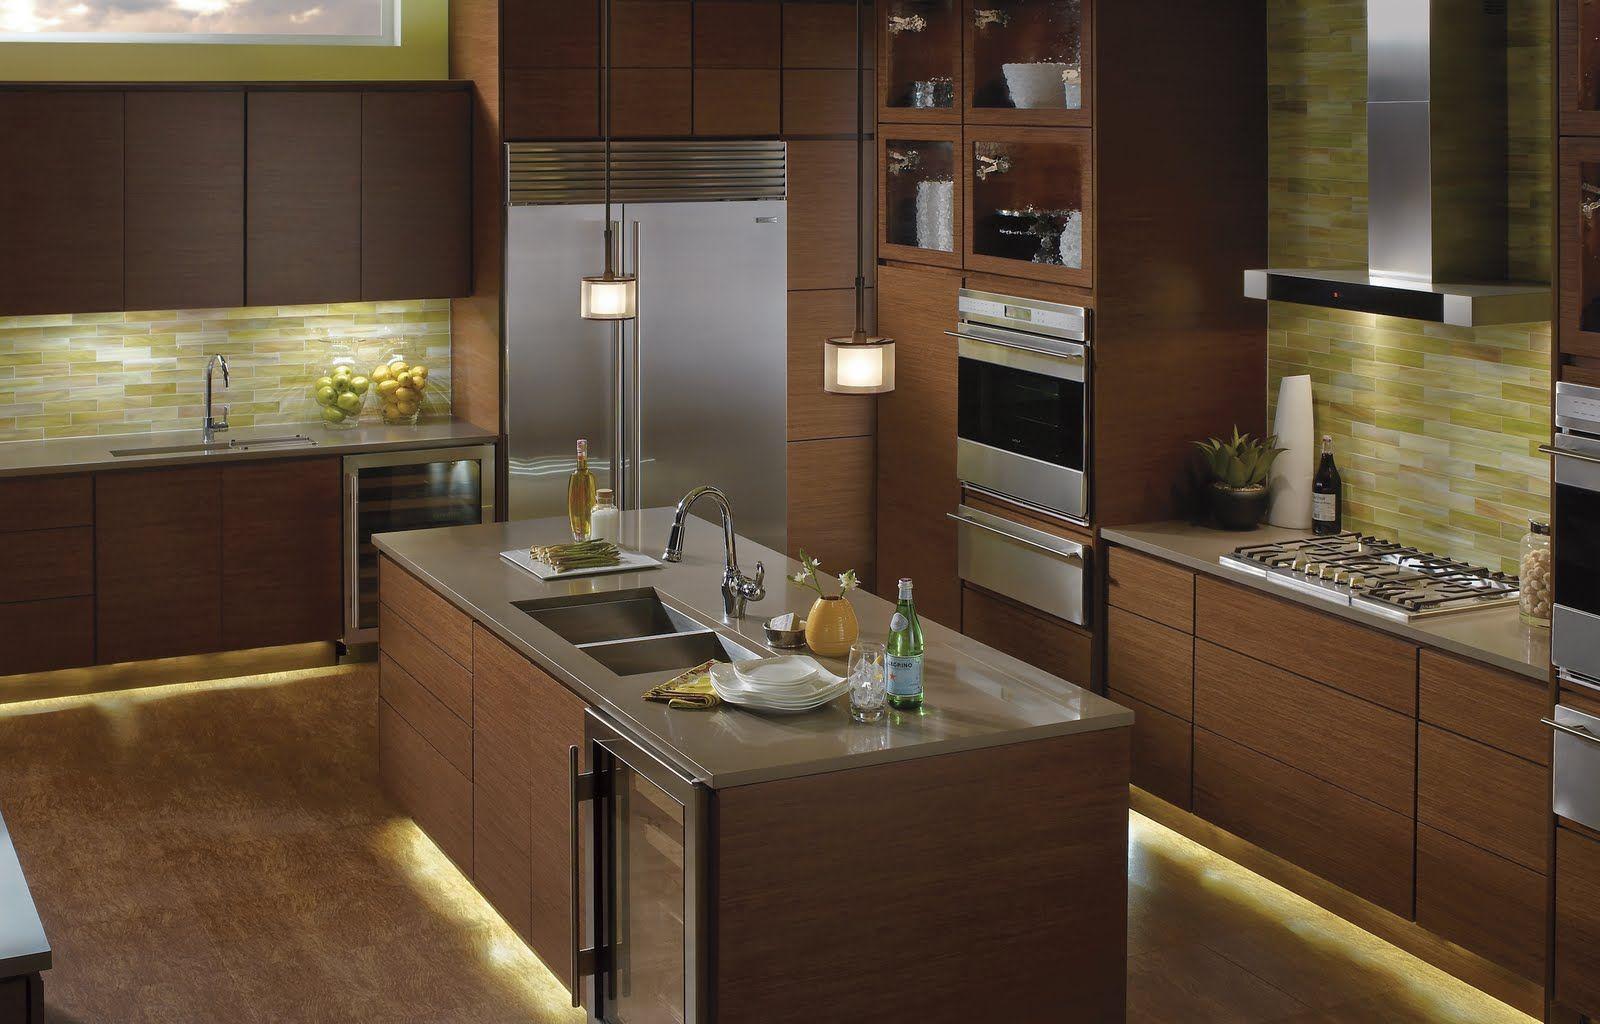 Kichler Under Cabinet Lighting: Steel Lily Design Layering Light In  Interiors